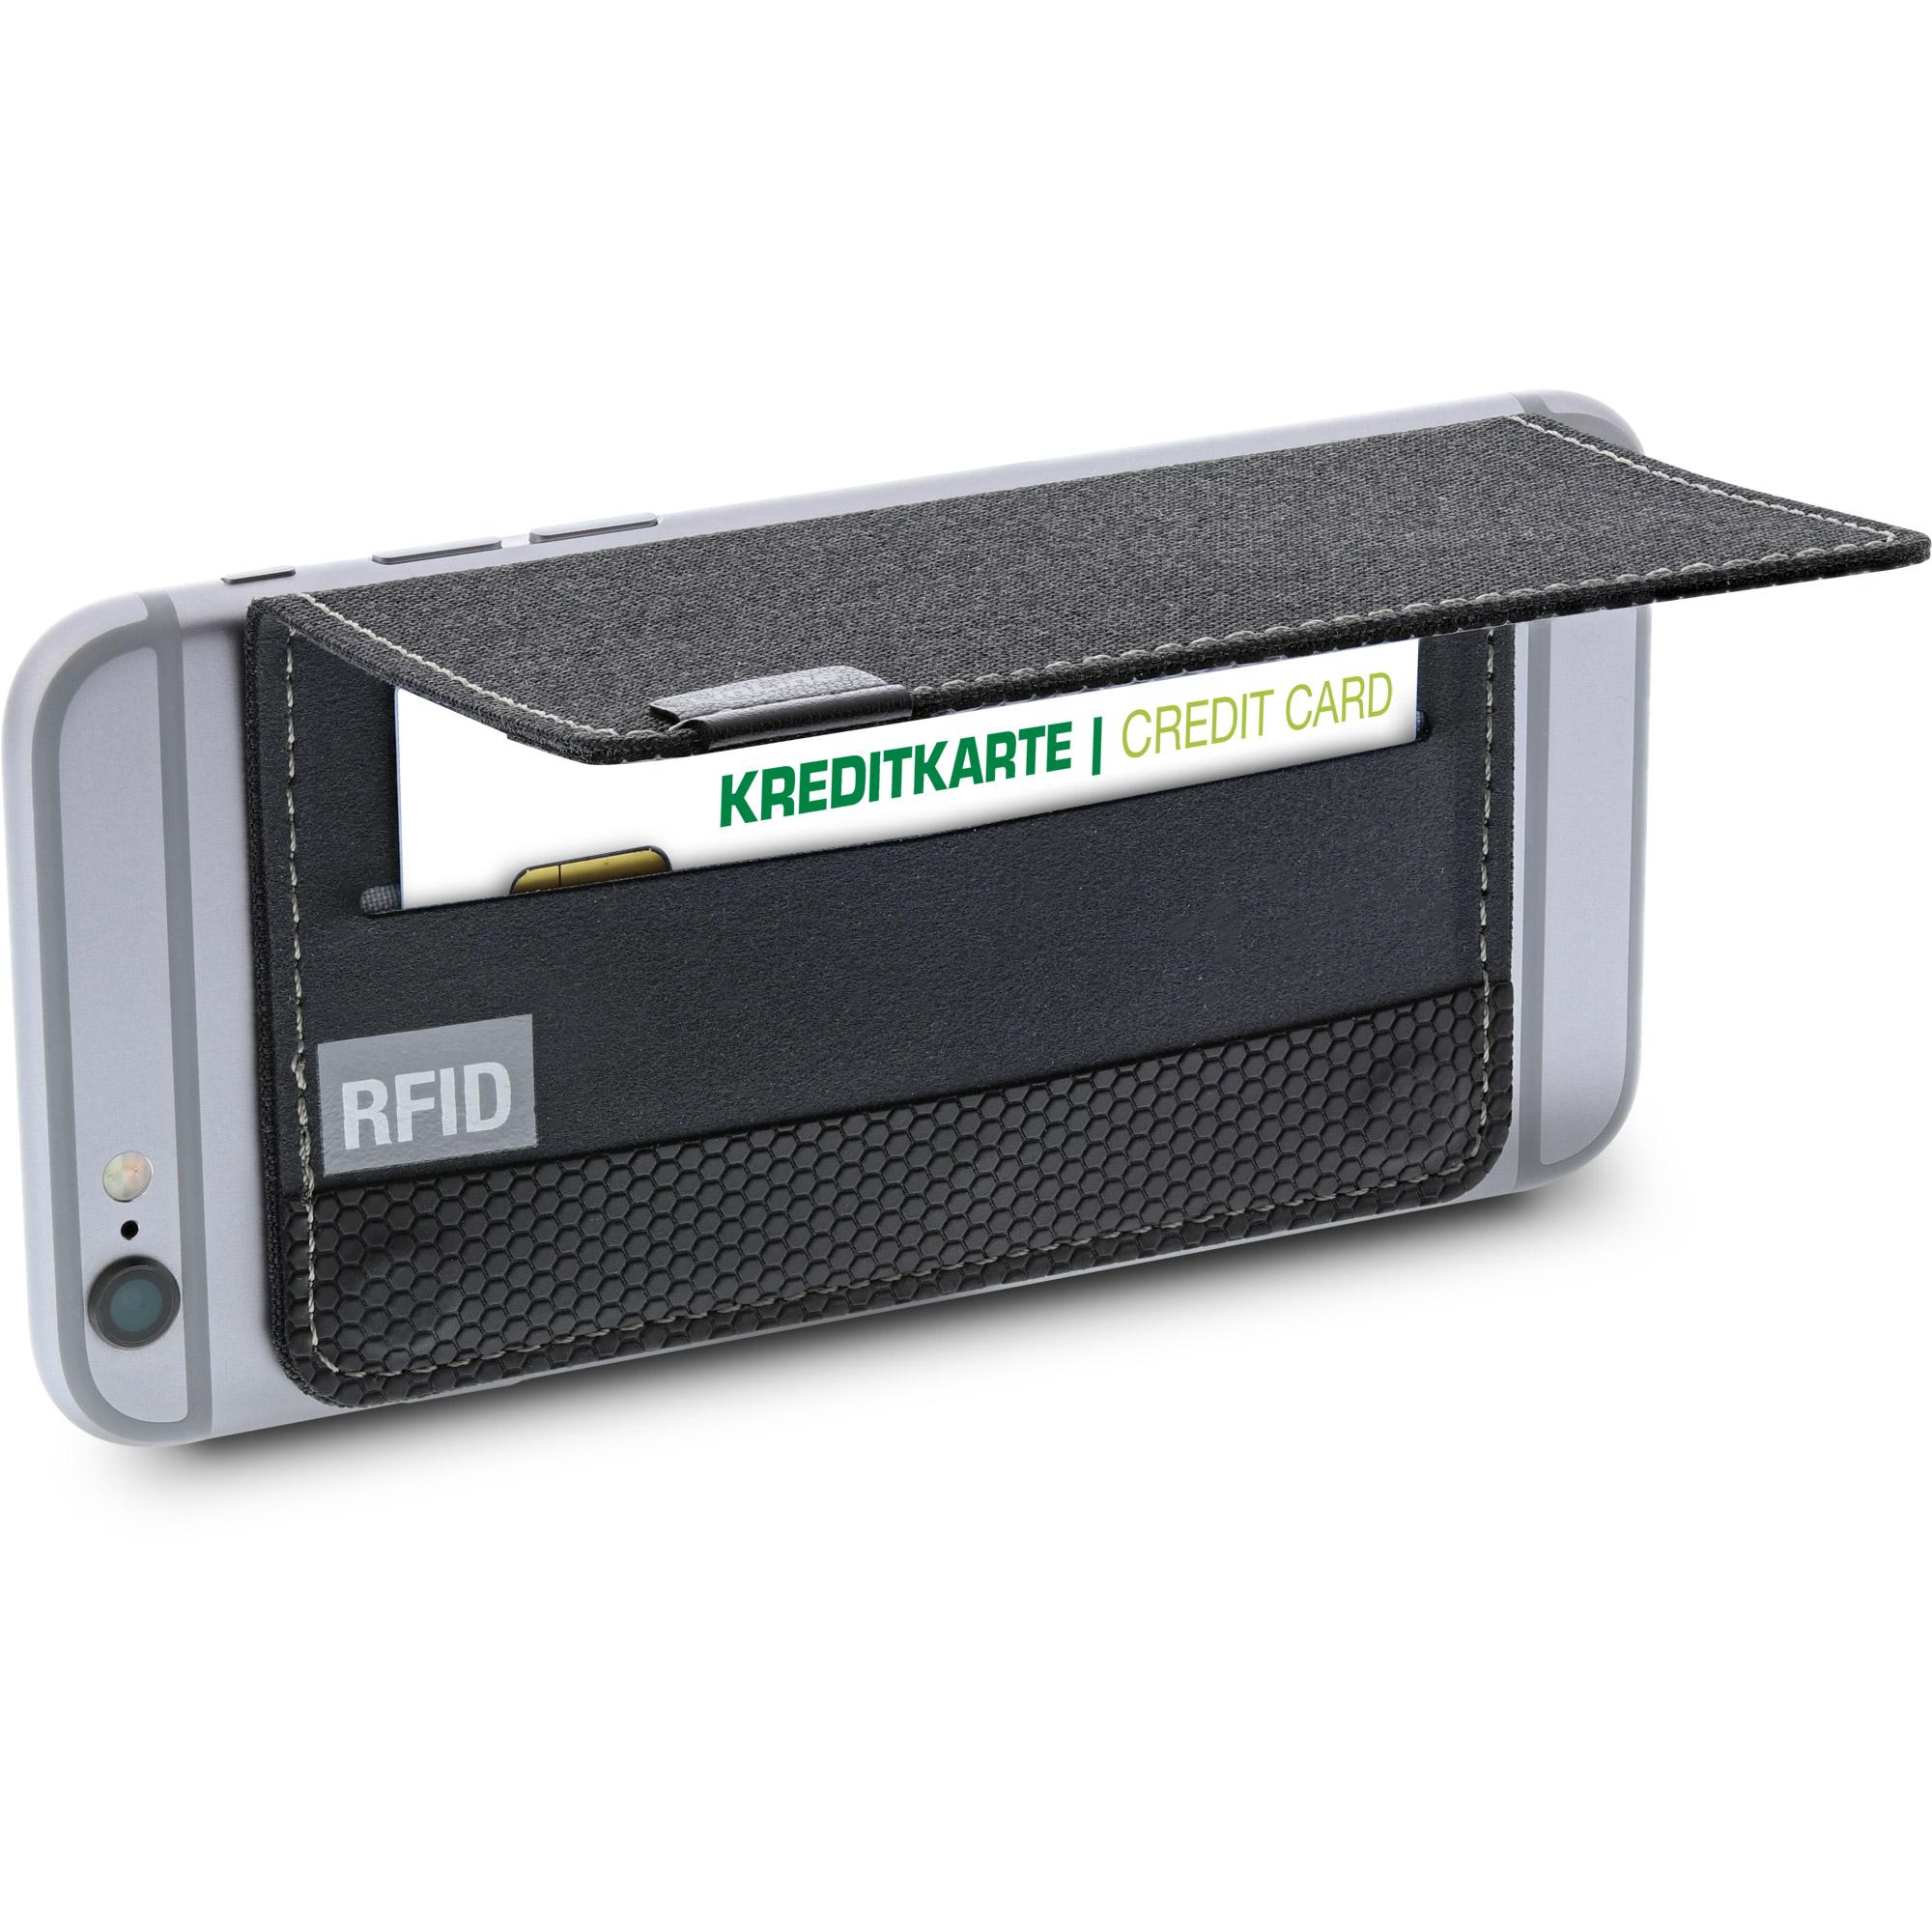 Tragbares Audio & Video Digital Usb Stereo Tragbare Adapter Radio Empfänger Auto Tupfen Mini Durable Für Android Navigation Heimgebrauch System Dongle Unterhaltungselektronik